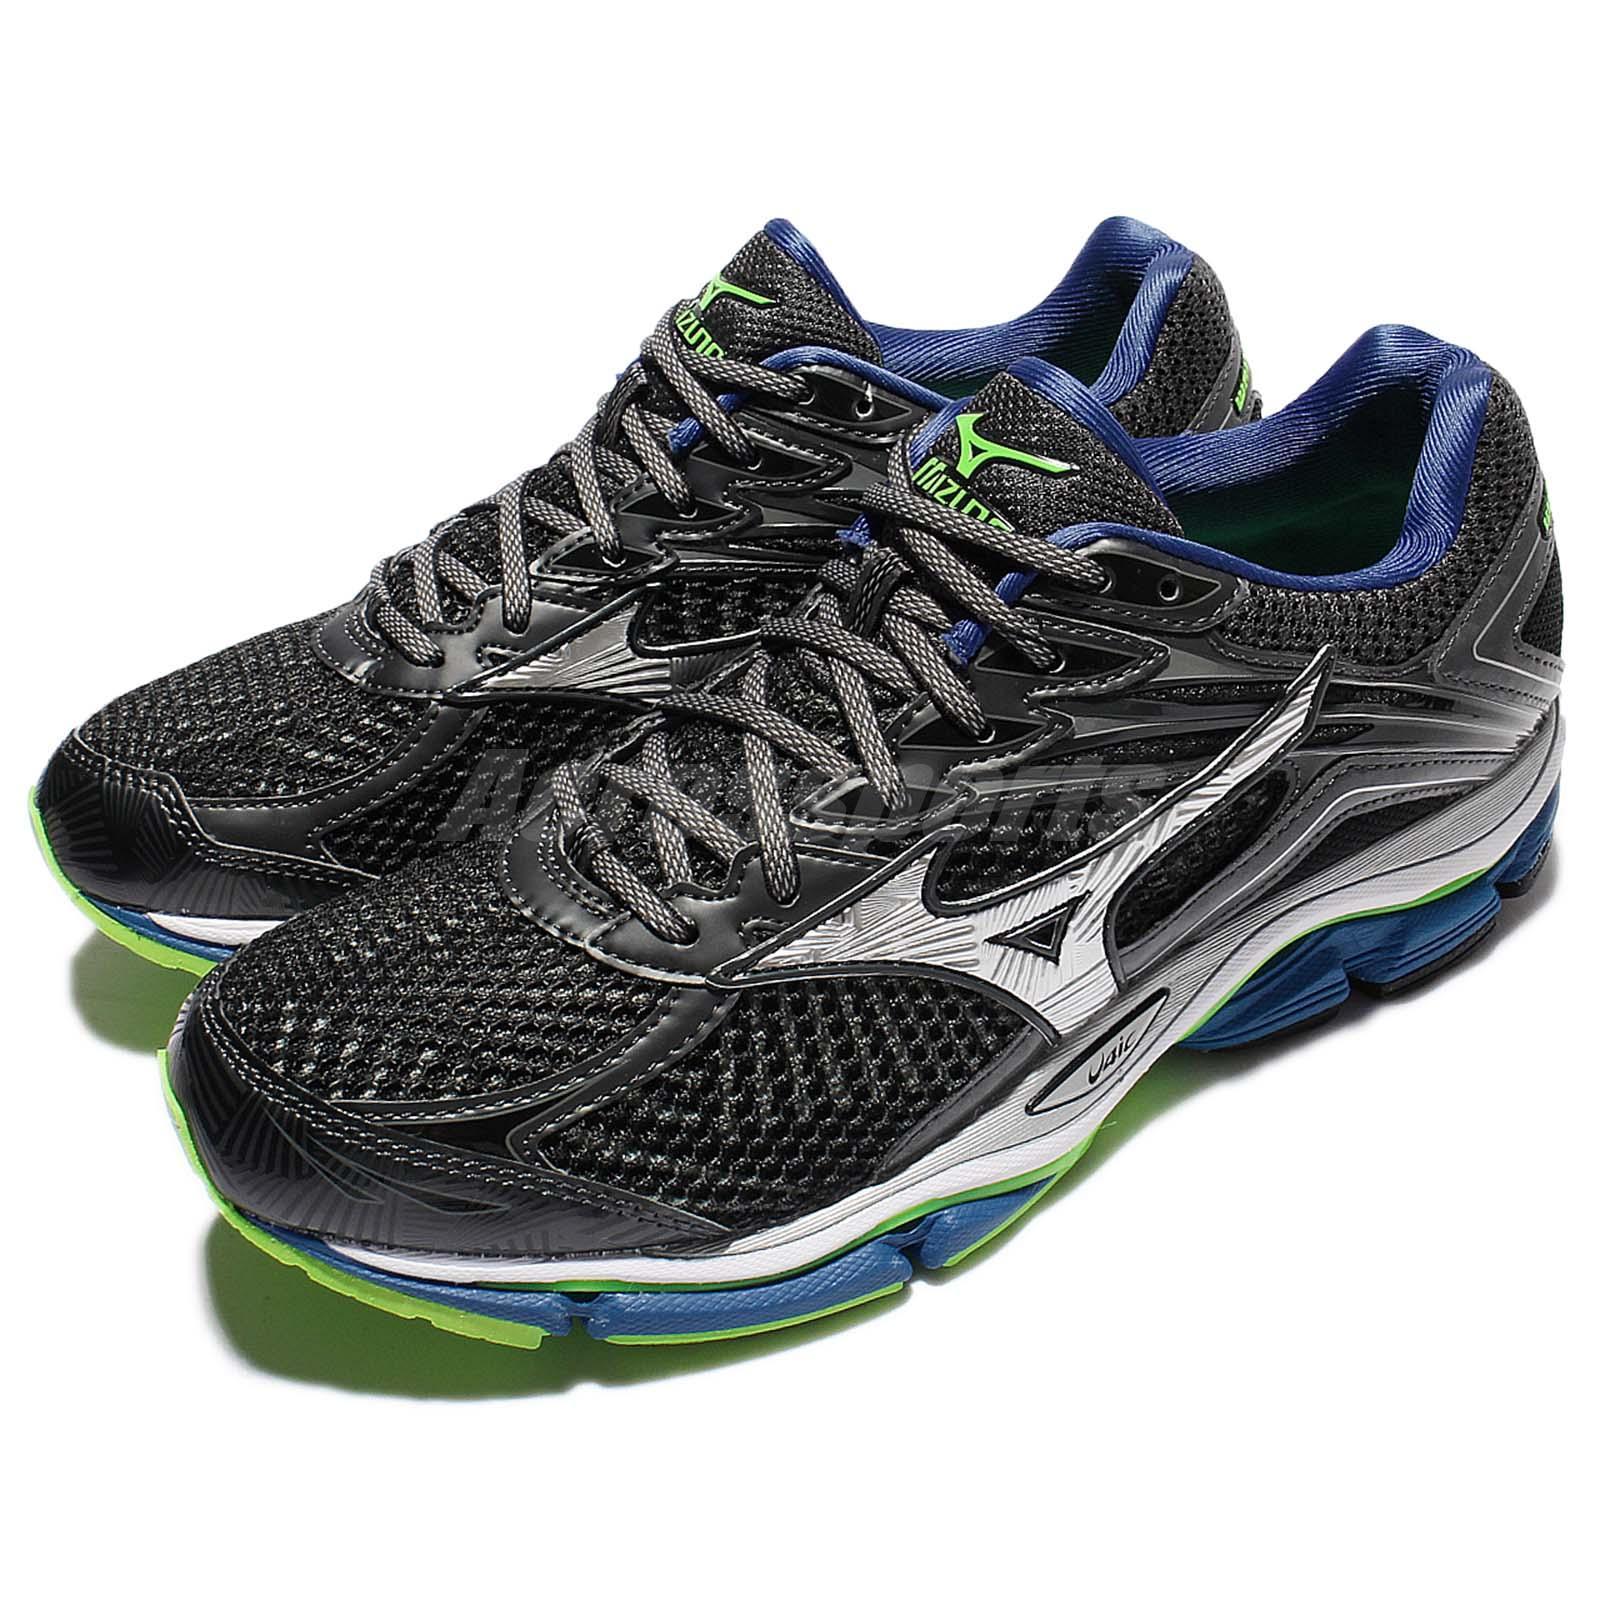 buy online 9c098 d2dee Details about Mizuno Wave Enigma 6 Grey Silver Blue Men Running Shoes  Sneakers J1GC1611-04